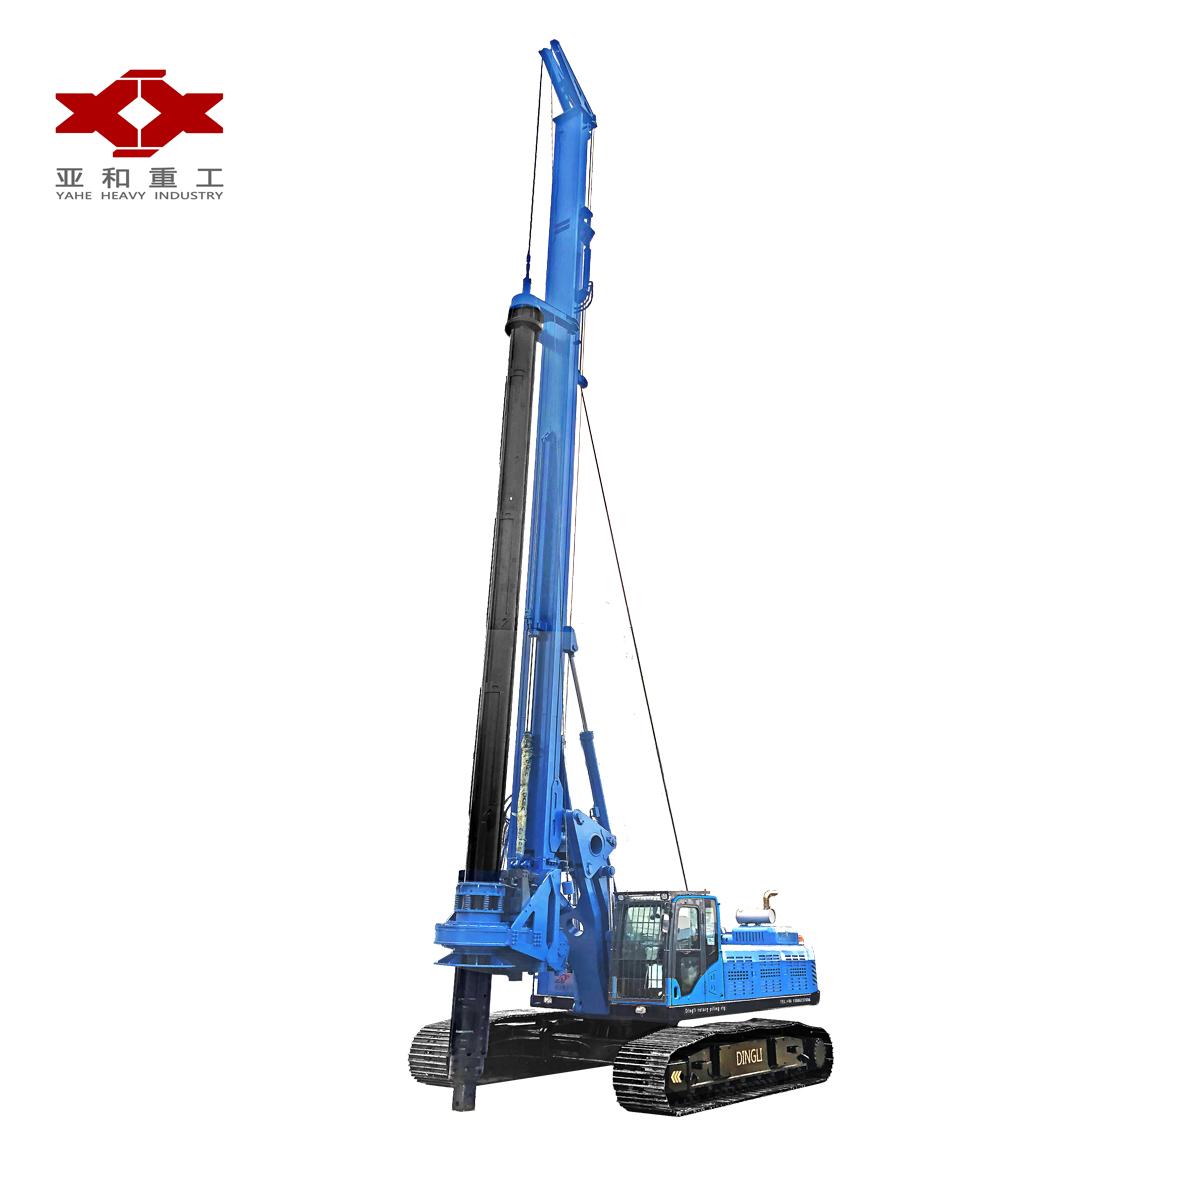 50m kelly bar rotary drilling rig